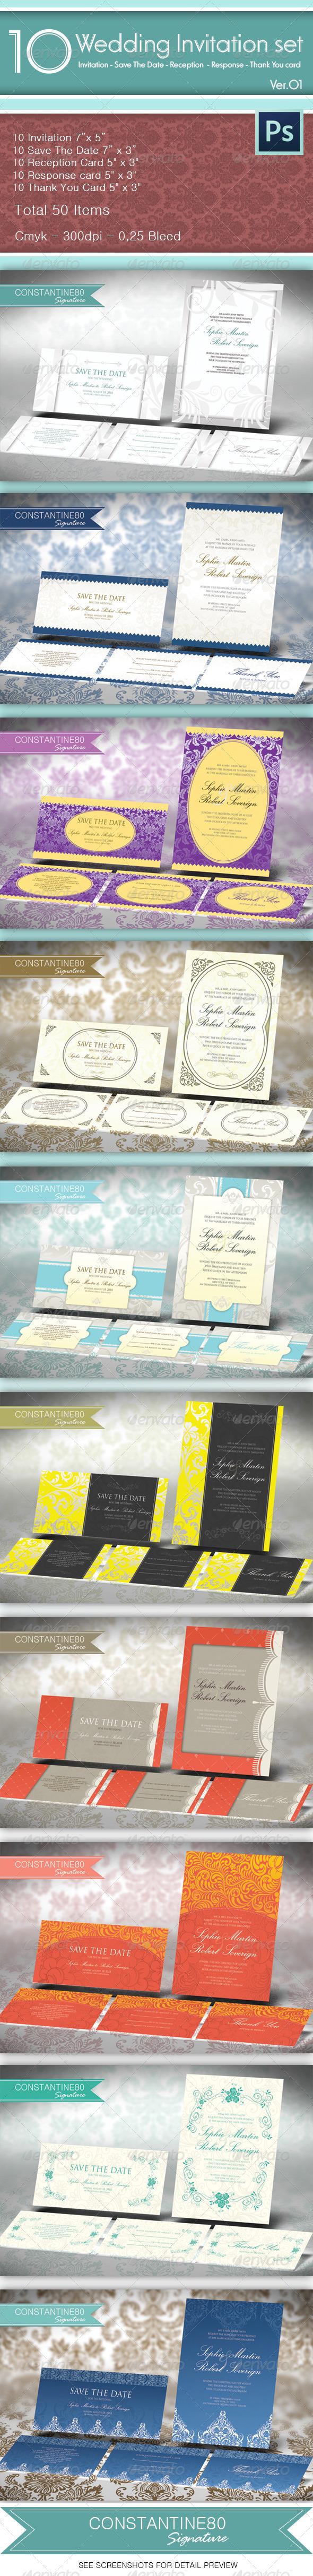 10 Wedding Invitations Sets - Invitations Cards & Invites